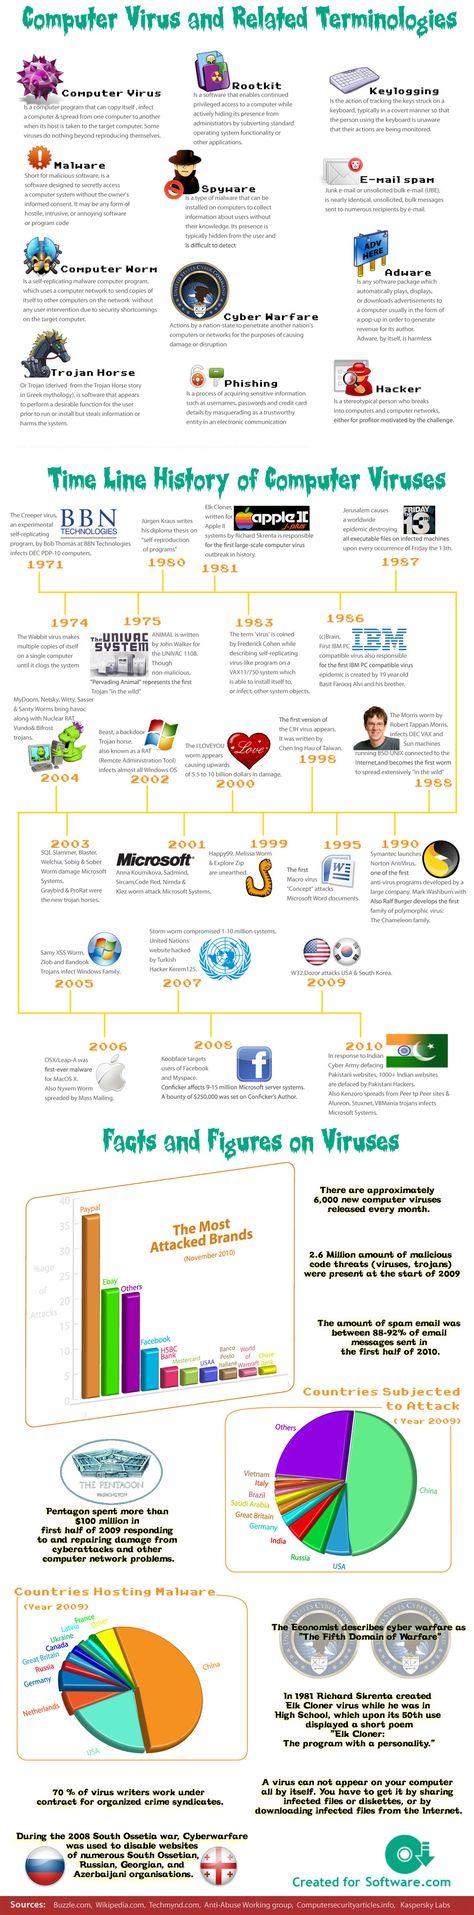 Antivirus Information